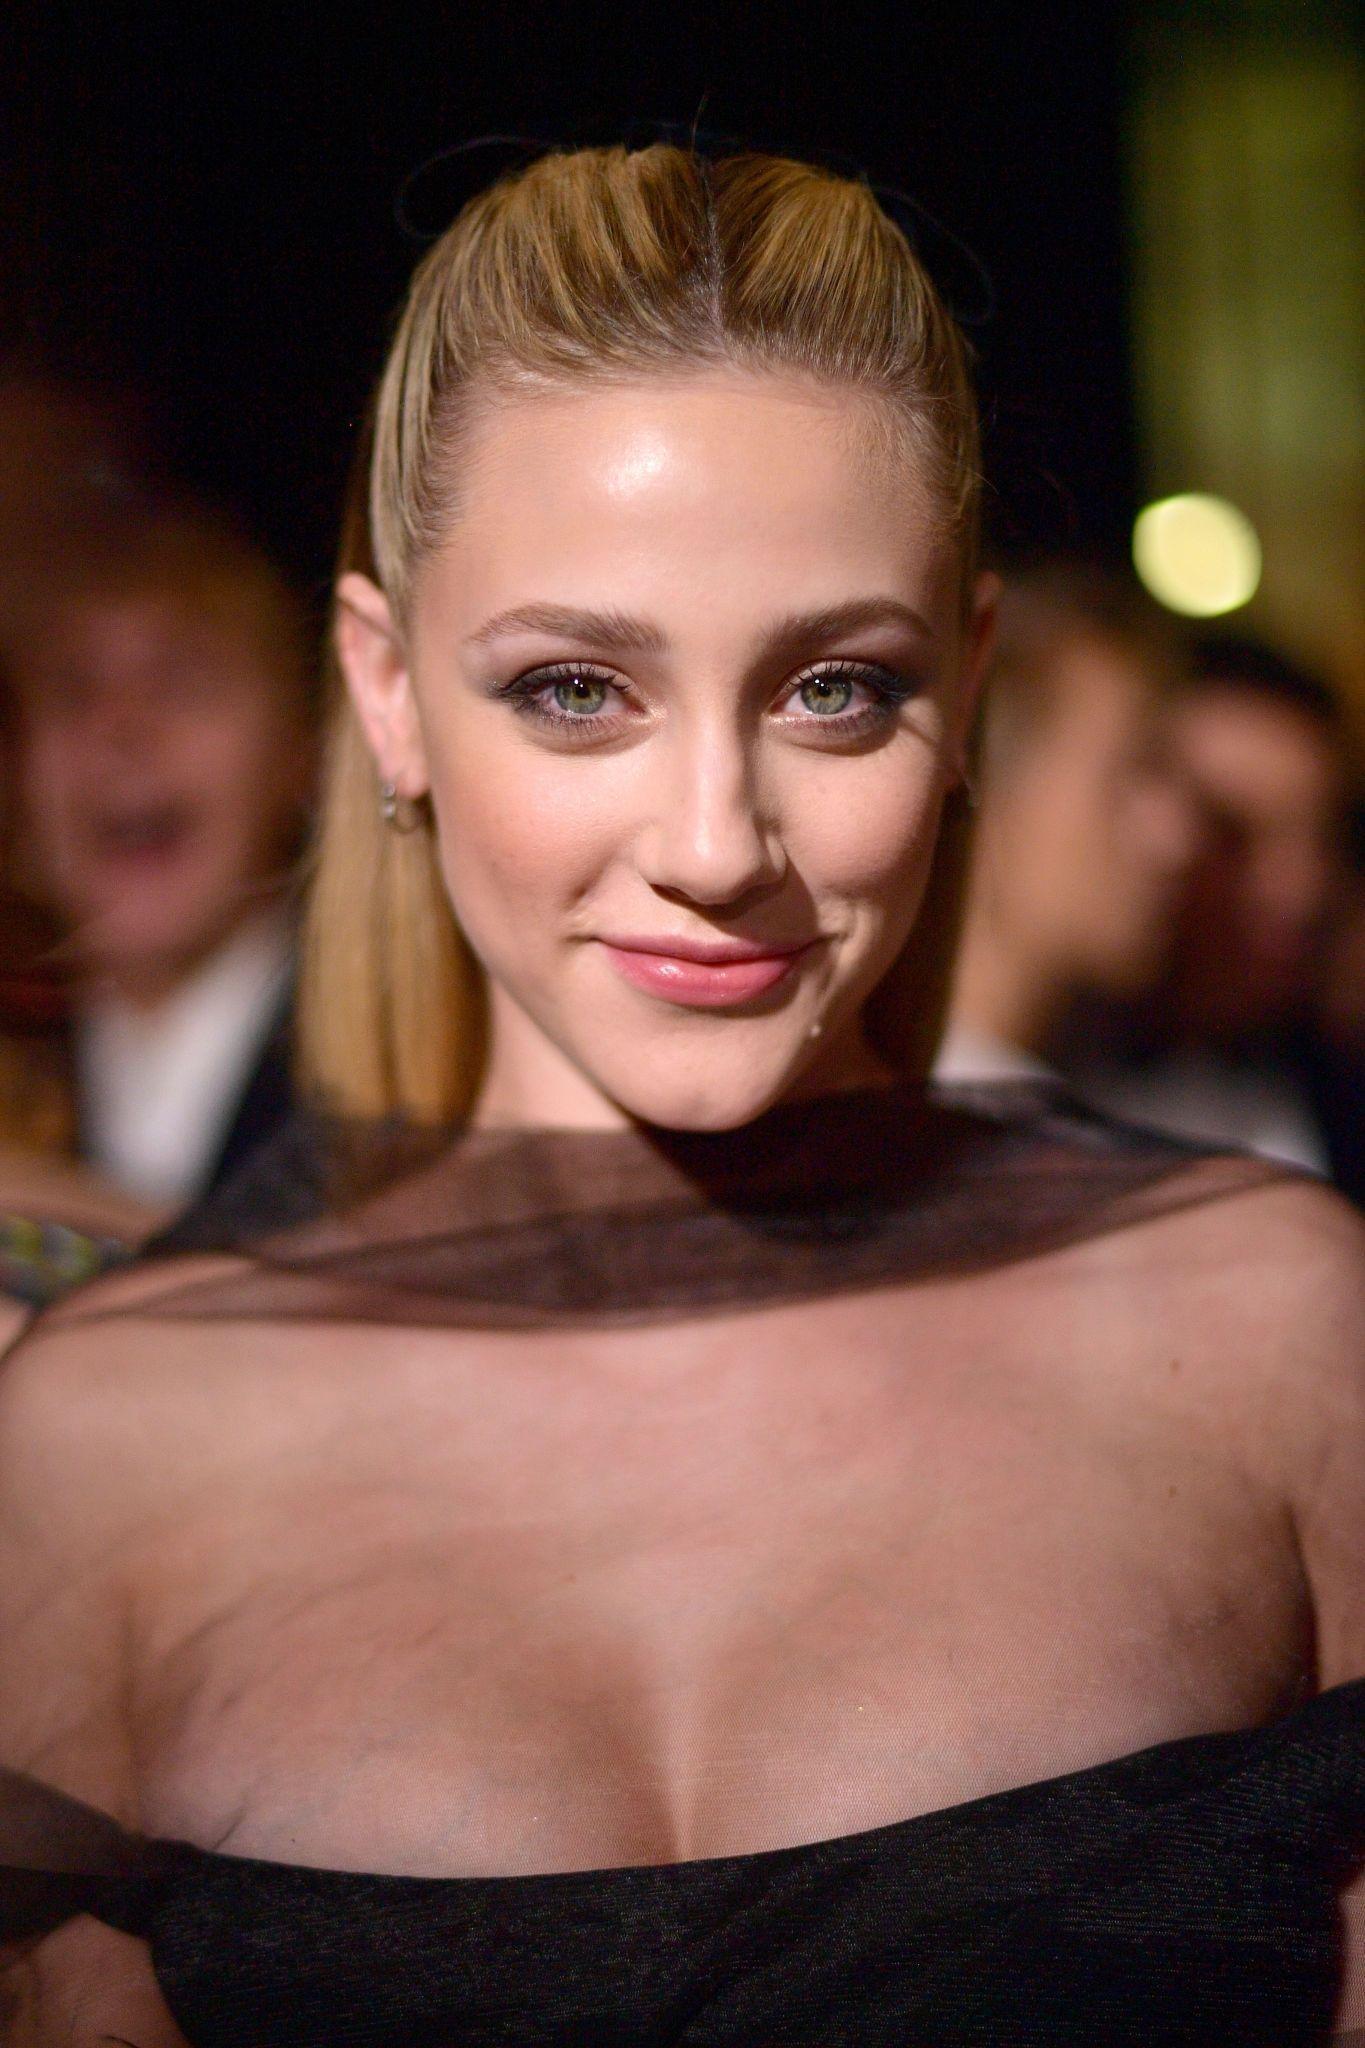 Fashion nudevideo Nude Photos